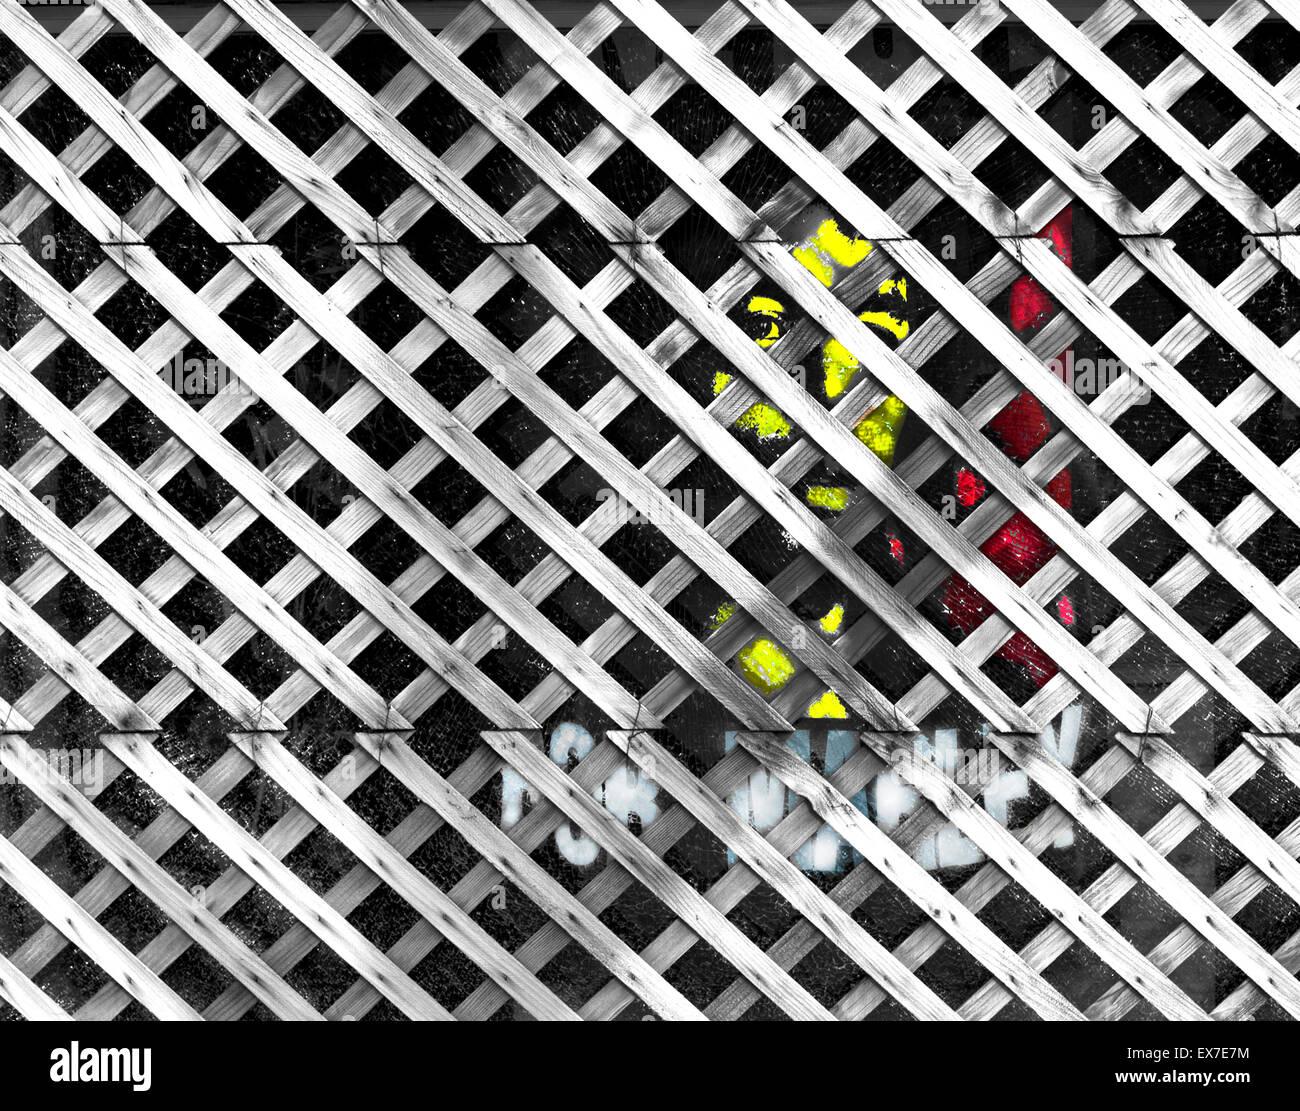 Bob Marley Stencil behind faded fence lattice Stock Photo: 84987384 ...